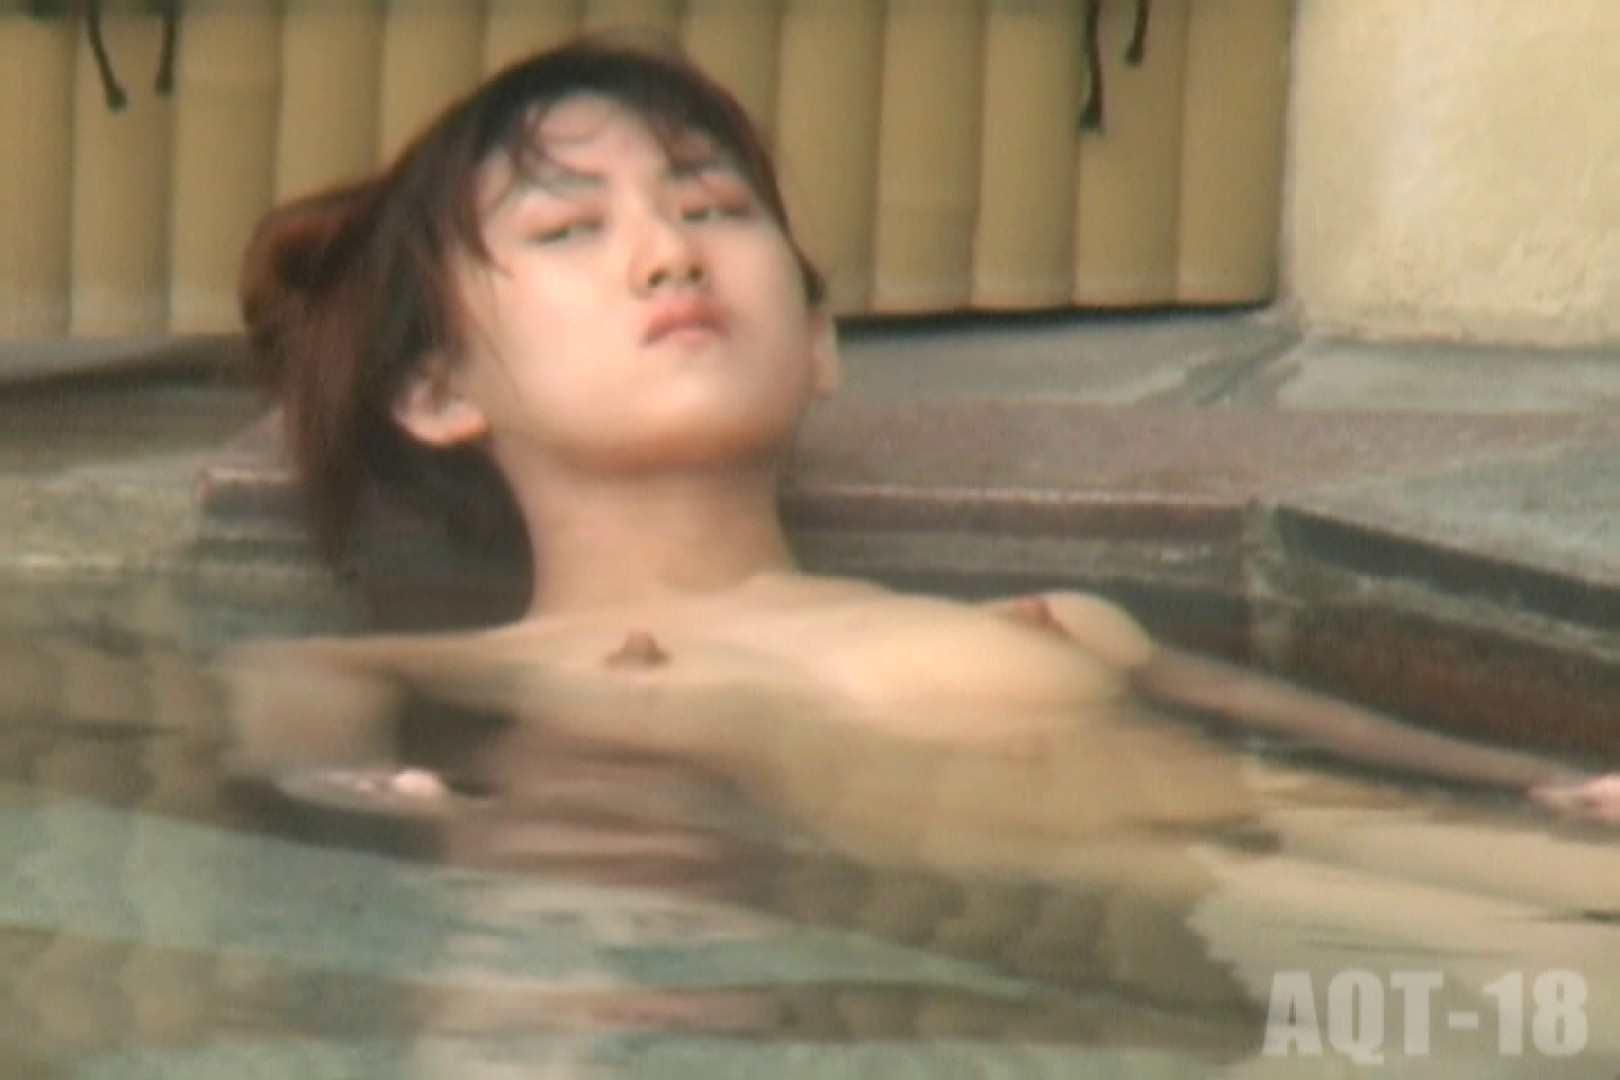 Aquaな露天風呂Vol.862 美しいOLの裸体 戯れ無修正画像 99pic 41